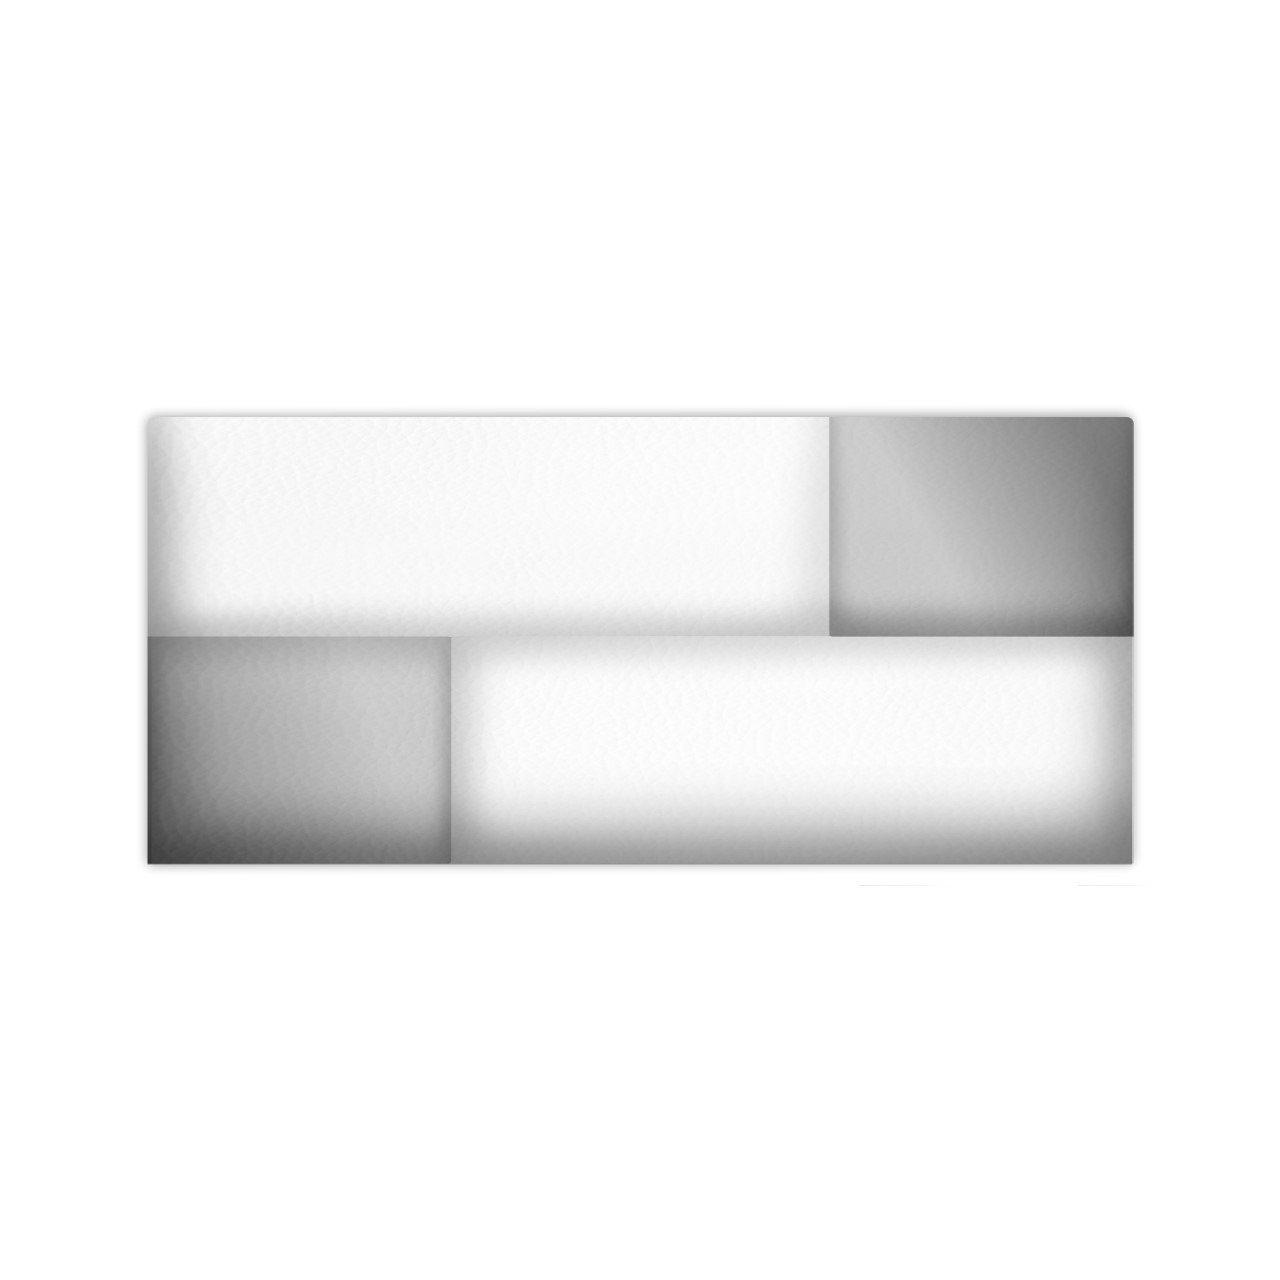 SUENOSZZZ - Cabecero Diseño Tokio. Color Blanco/Plata (Camas 135,150) 160X80X8 Cms.